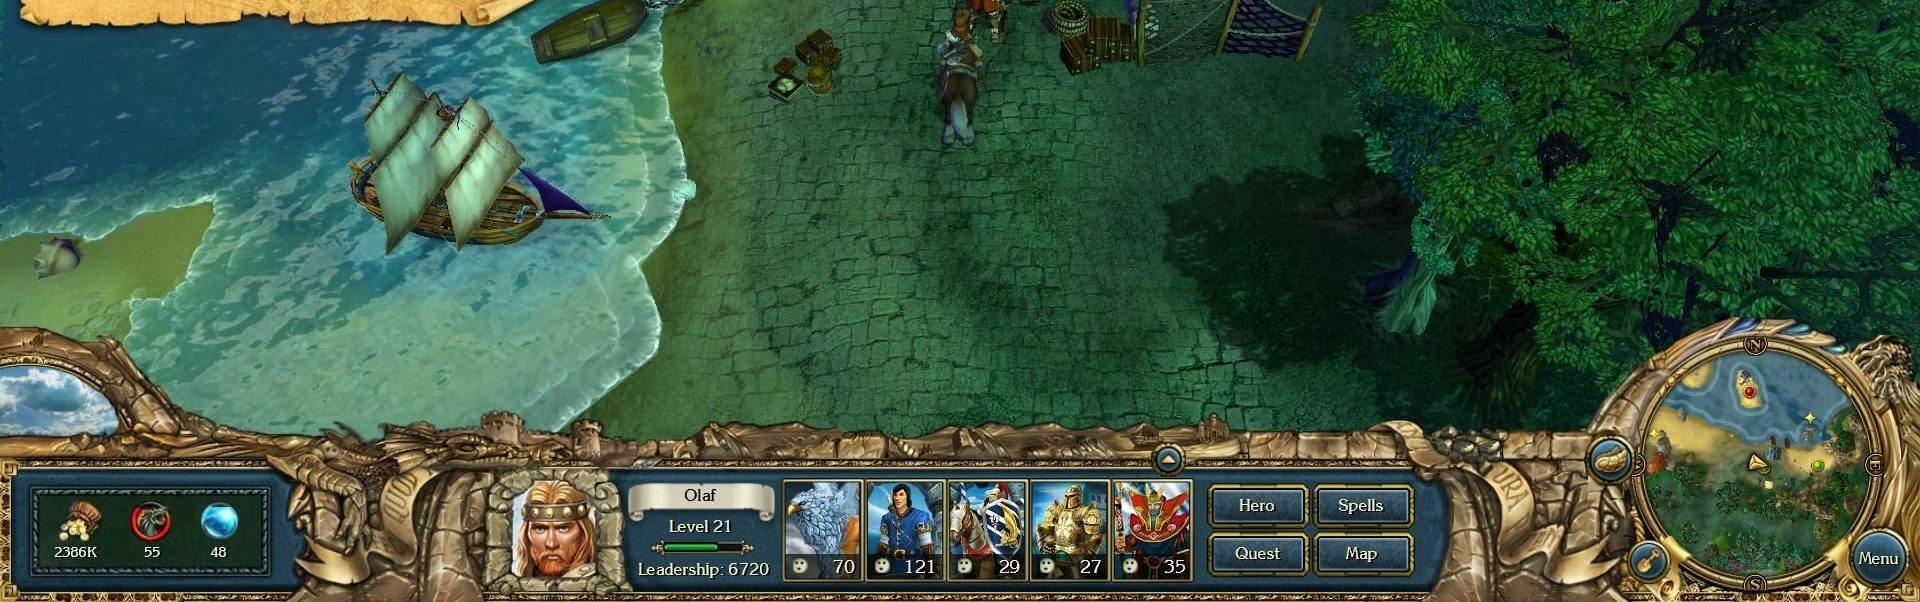 King's Bounty (Platinum Edition) Steam Key GLOBAL